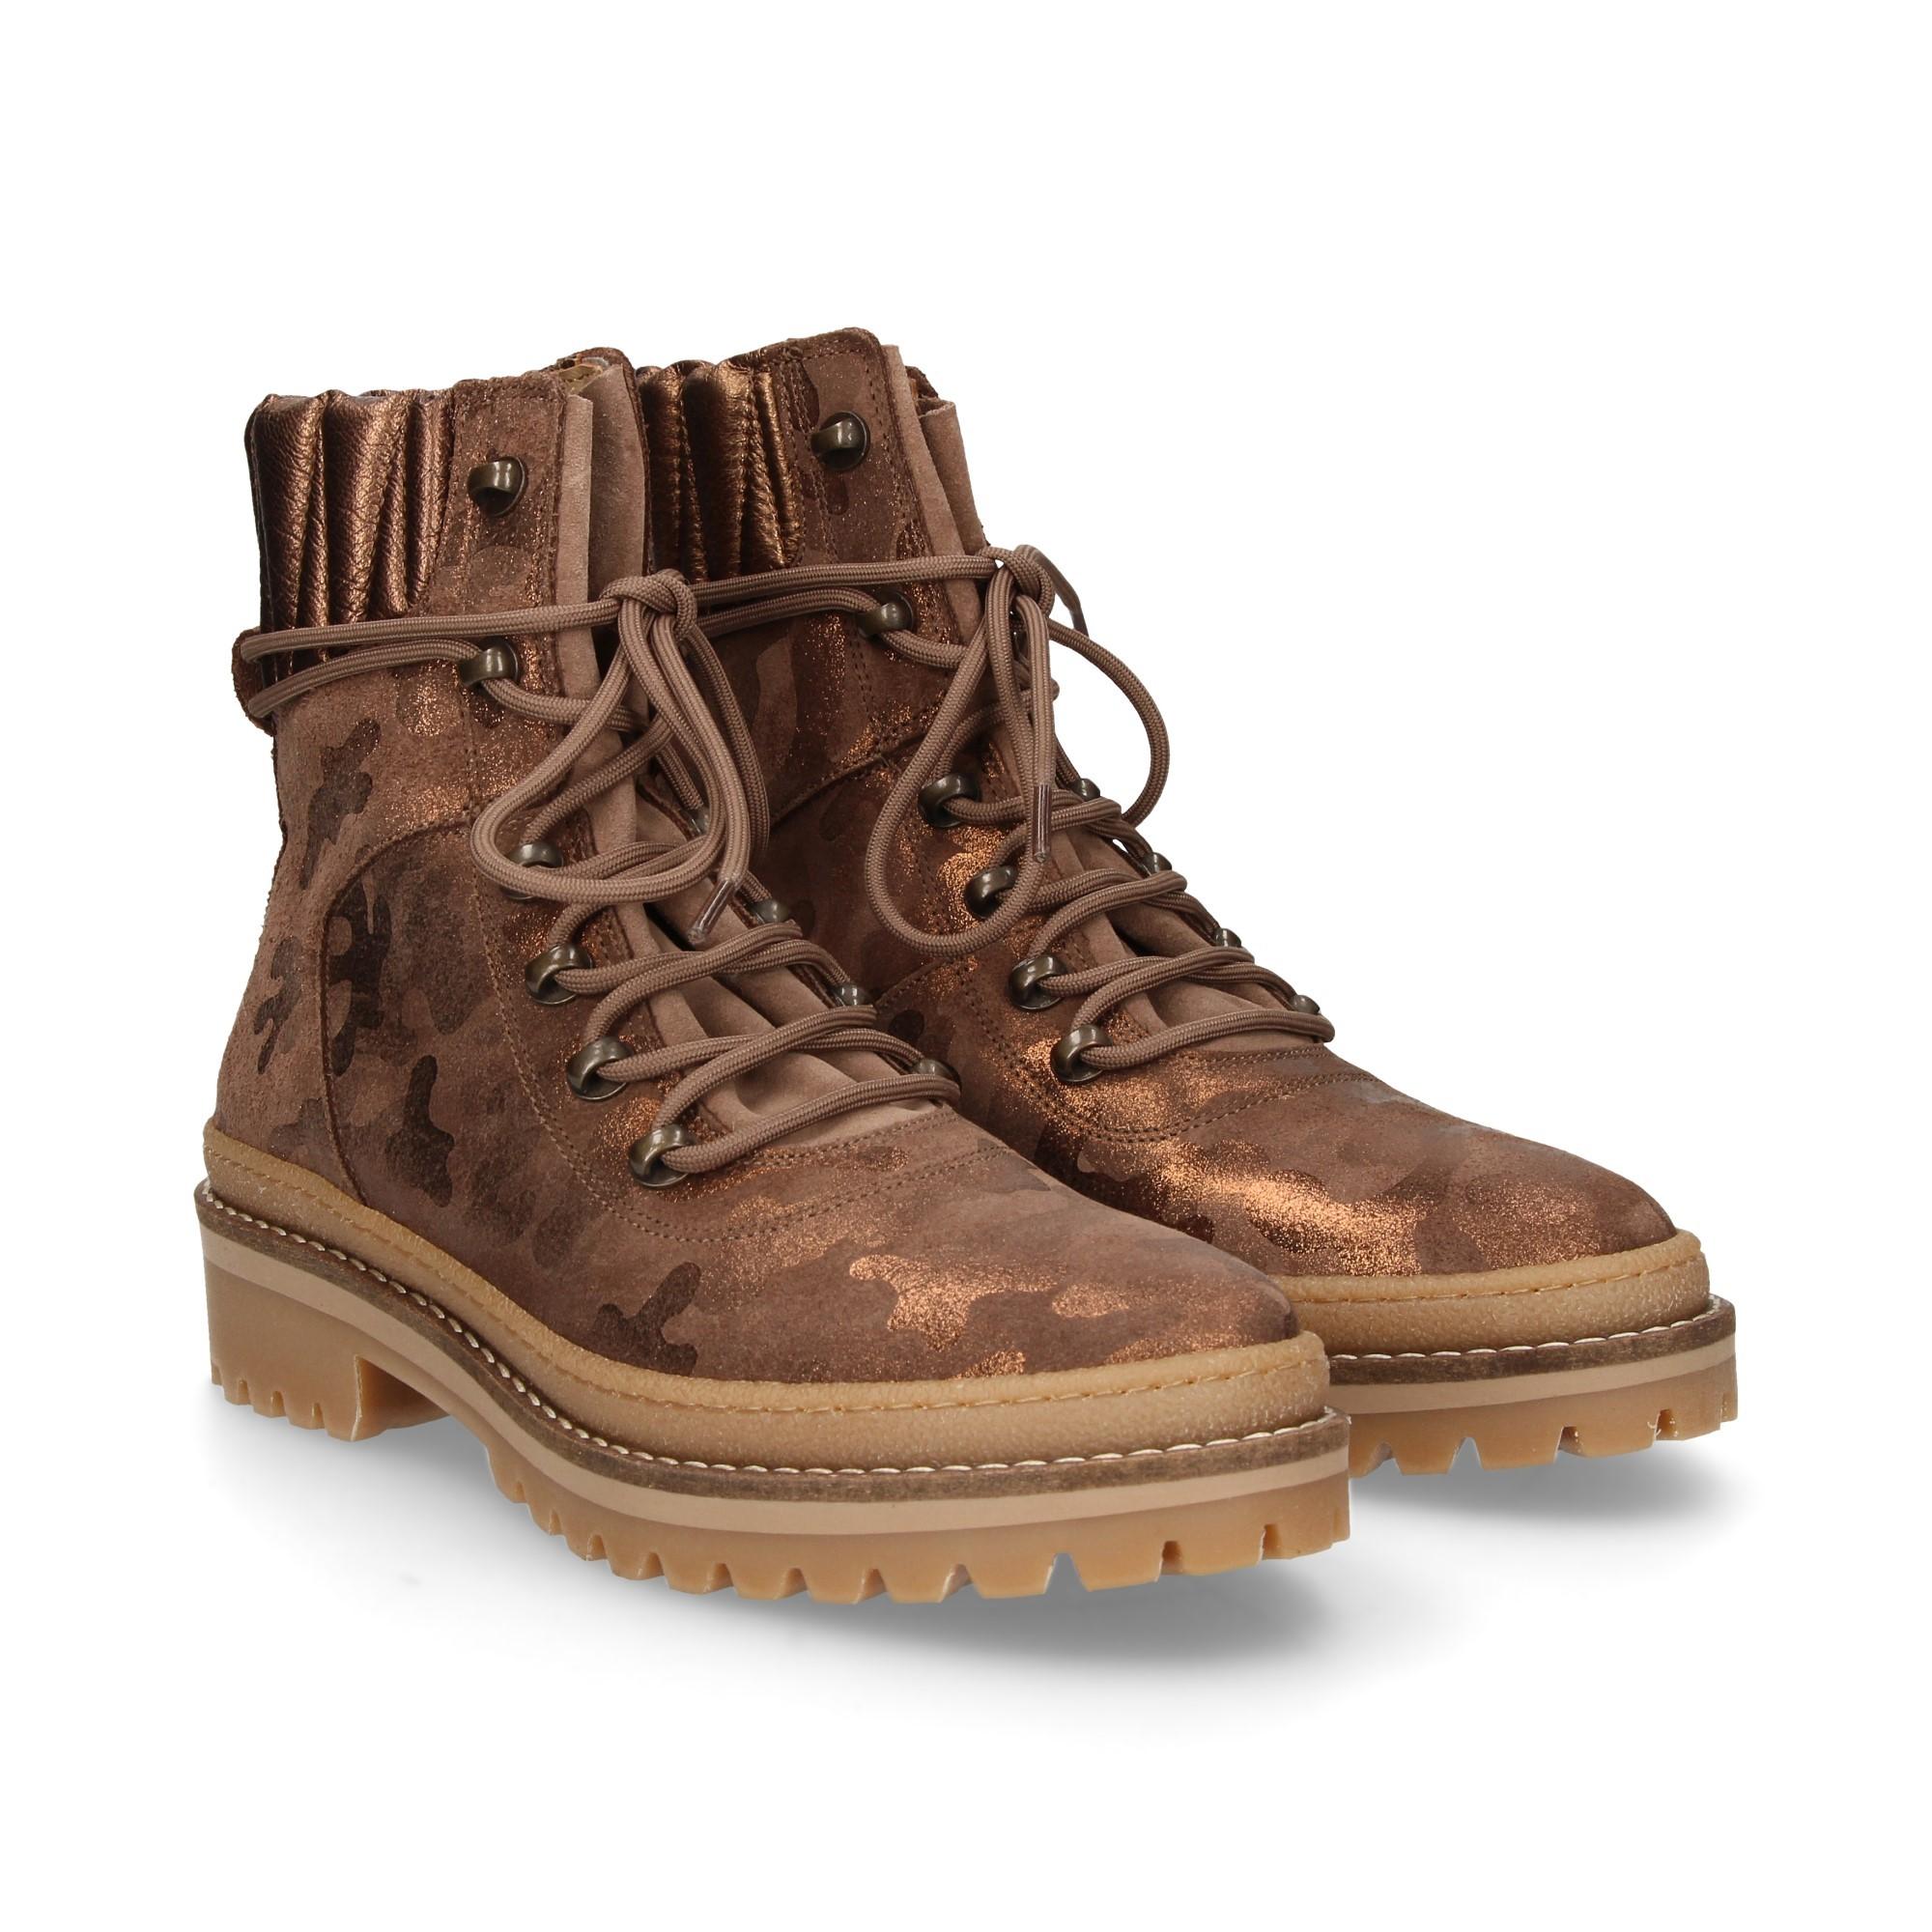 0c2a5f3e7aa3 TOMMY HILFIGER Women s flat ankle boots FW03447905 SHINY CAMO